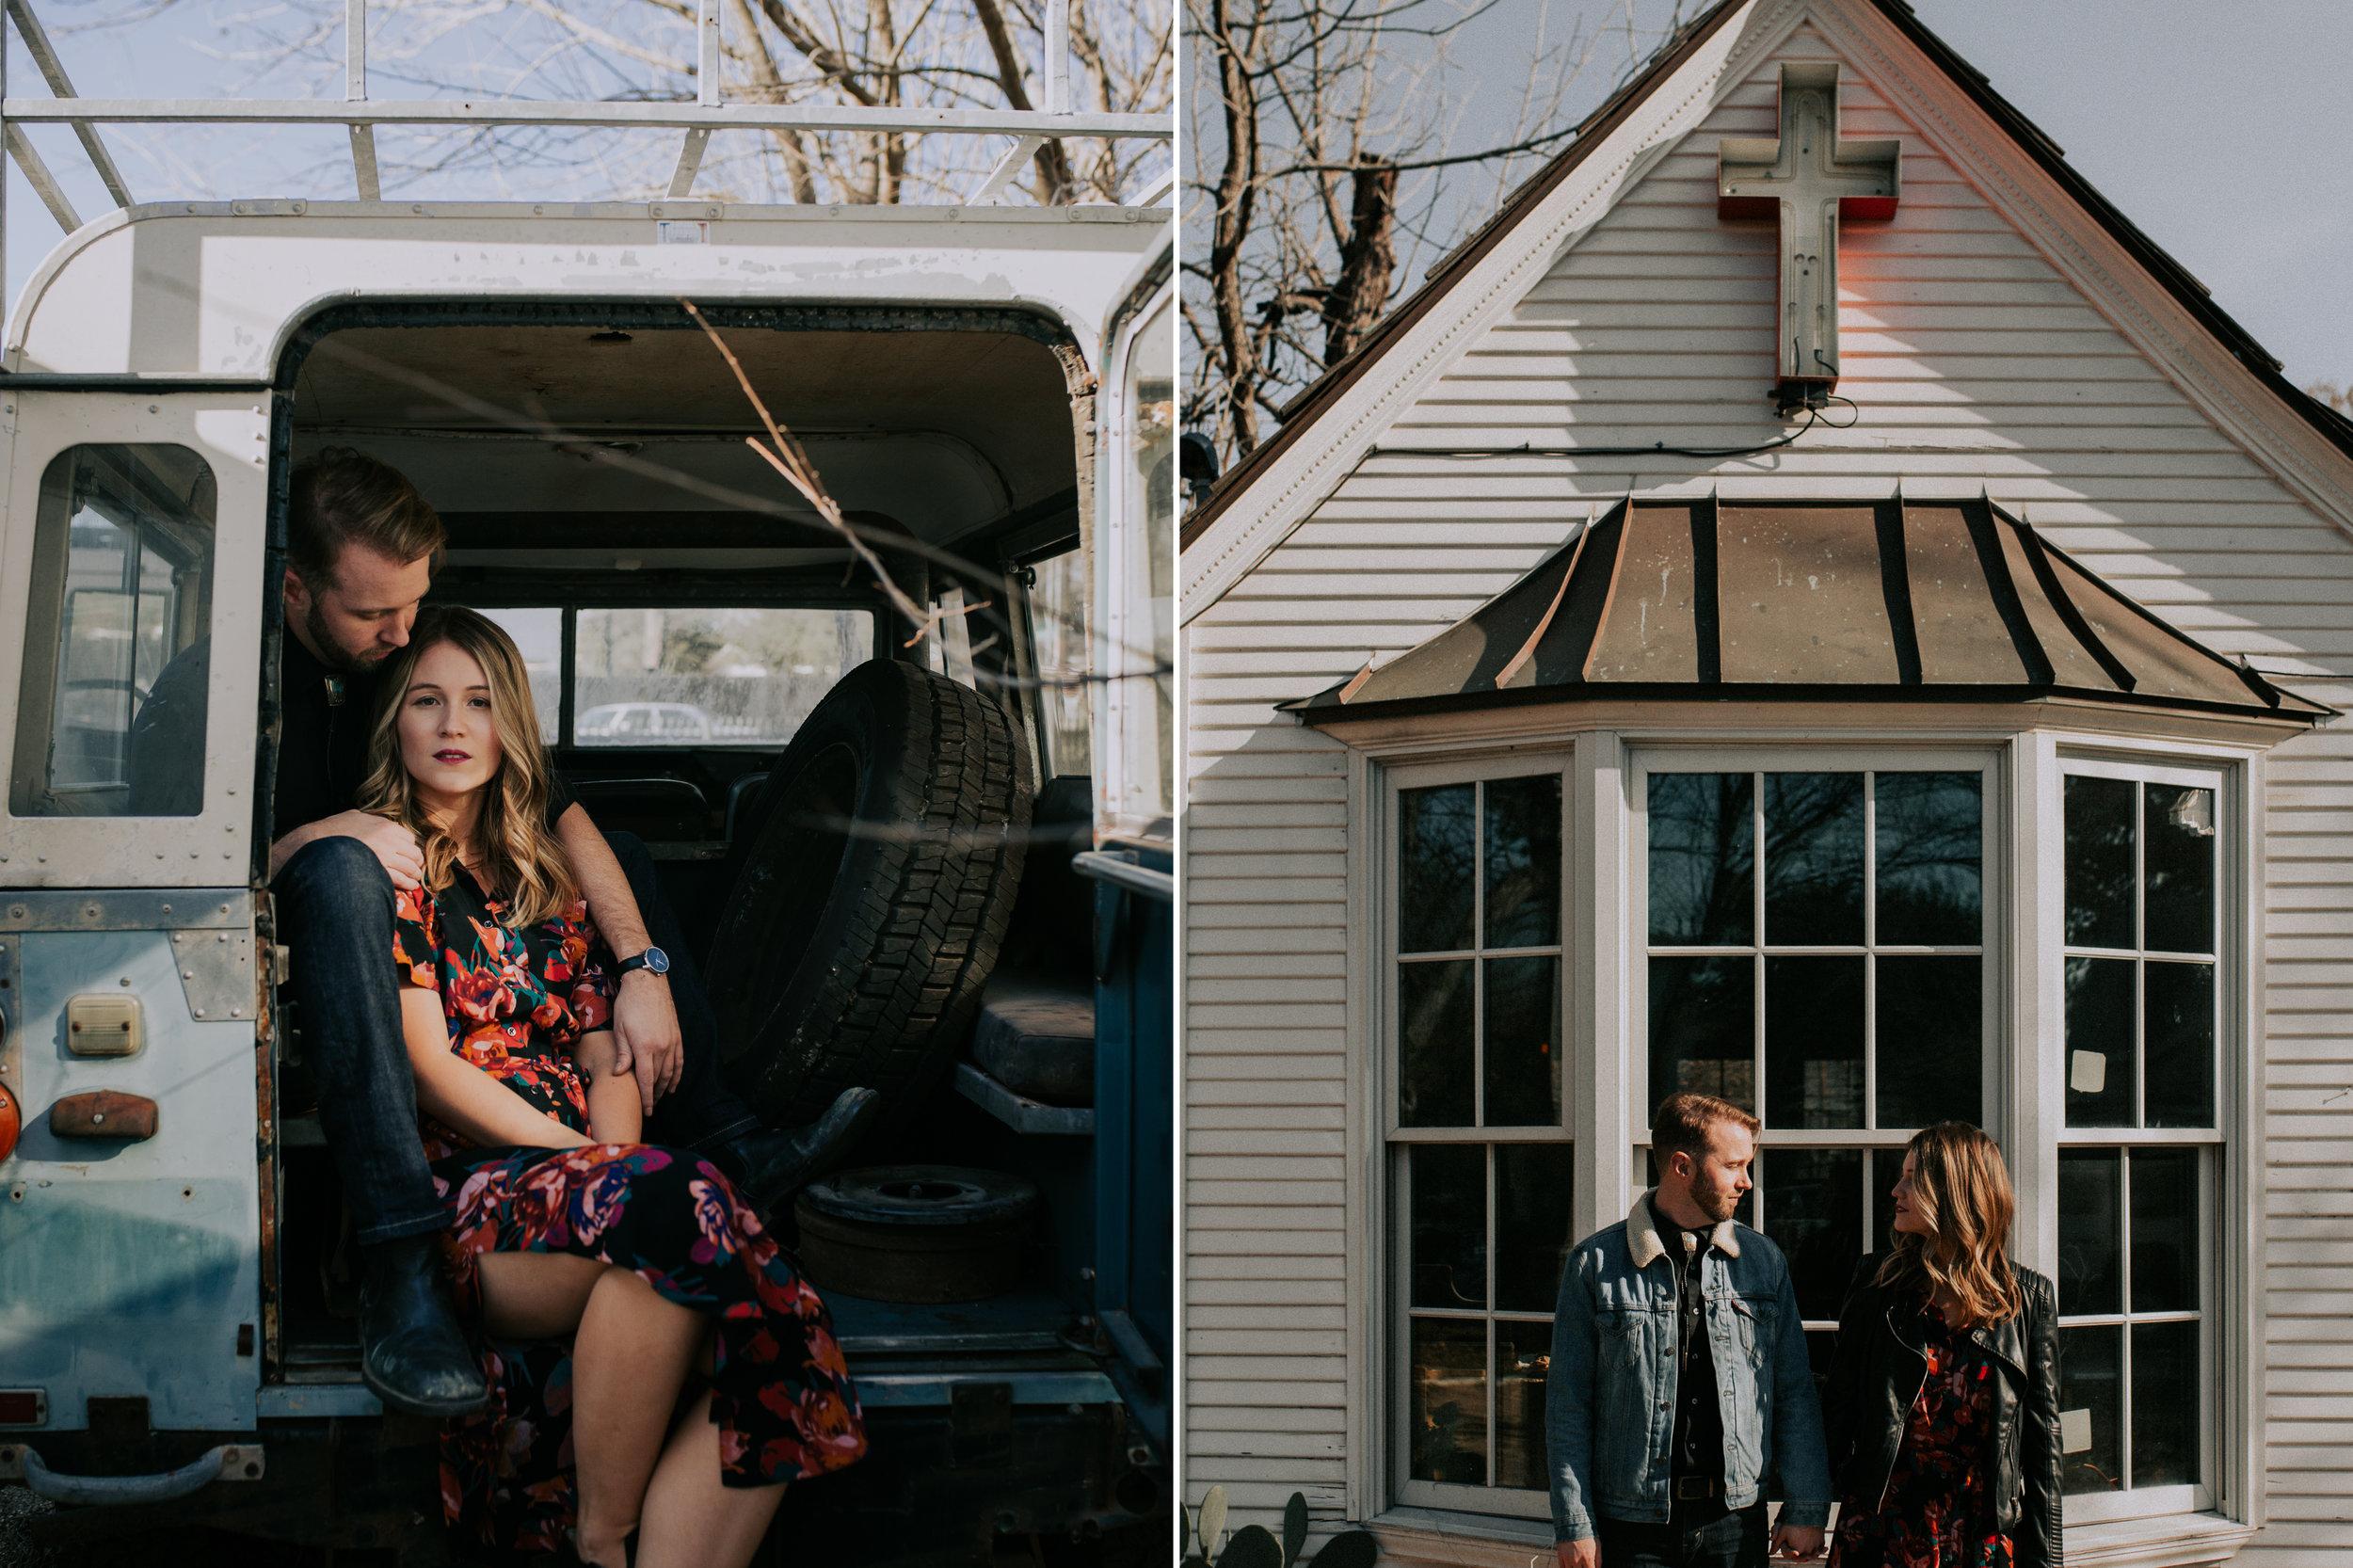 sekrit-theater-austin-texas-engagement-photographer-blog-3.jpg